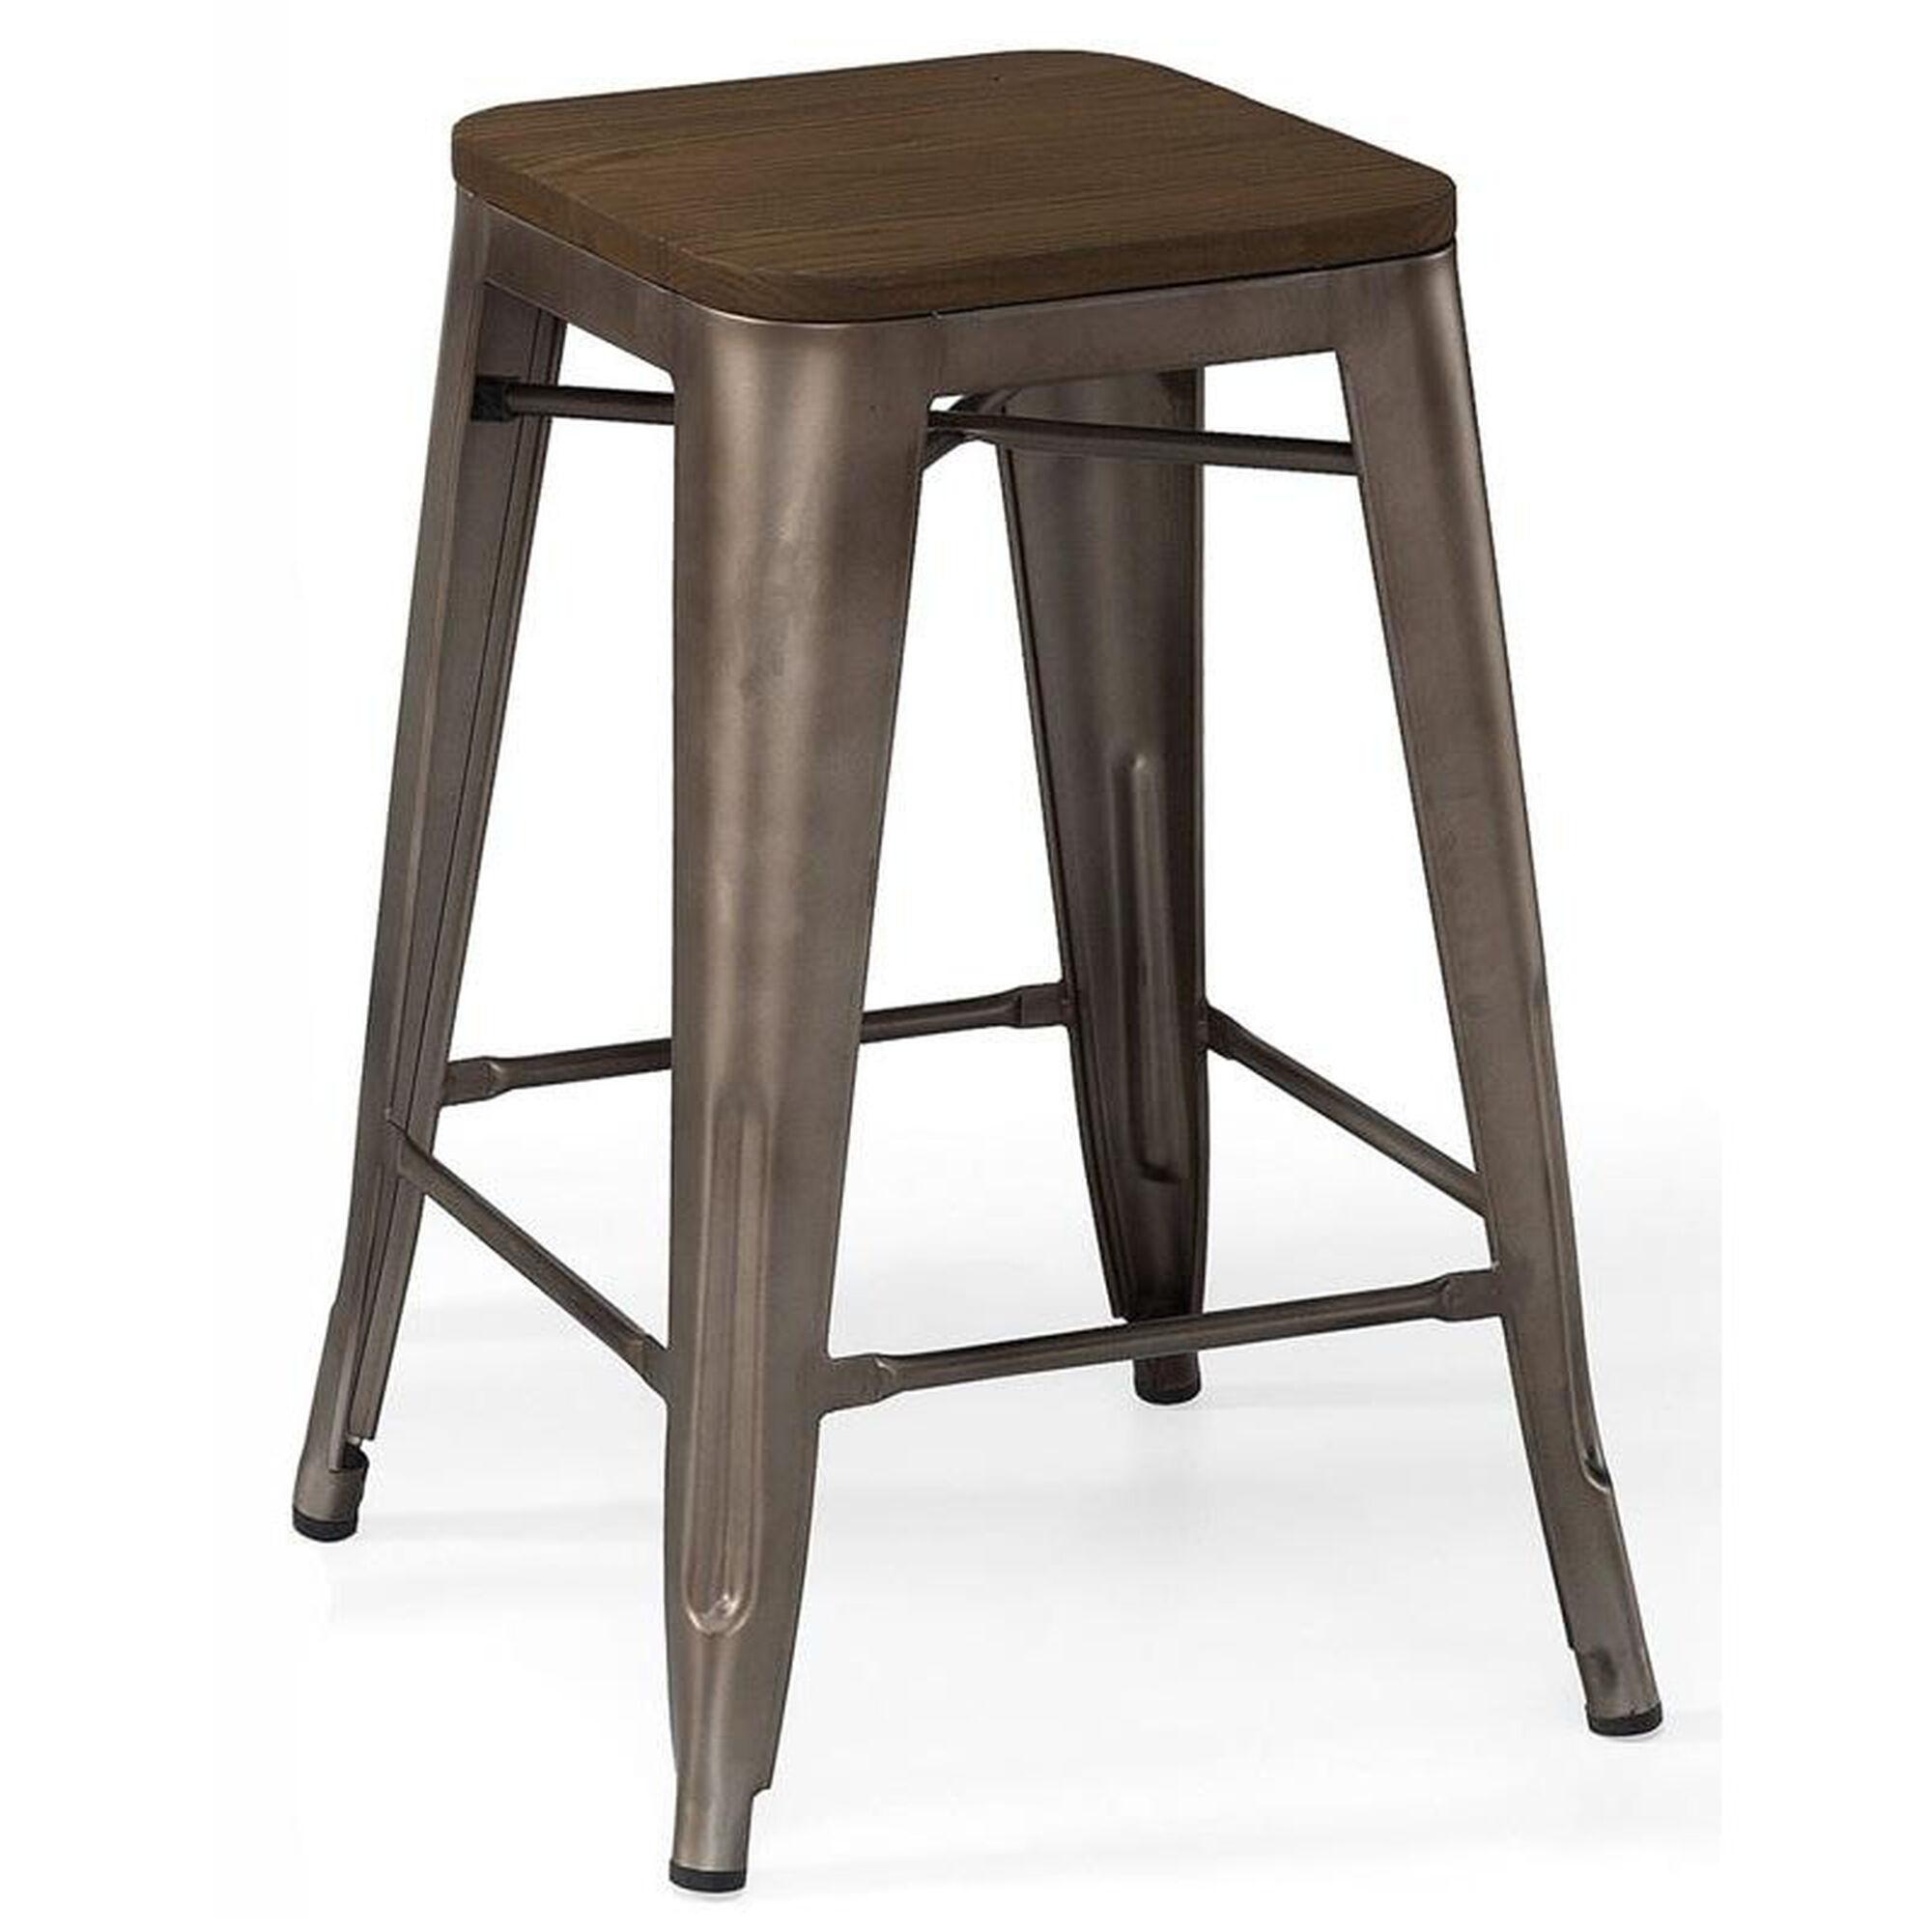 Design Lab Mn Dreux Rustic Matte Steel Stackable Counter